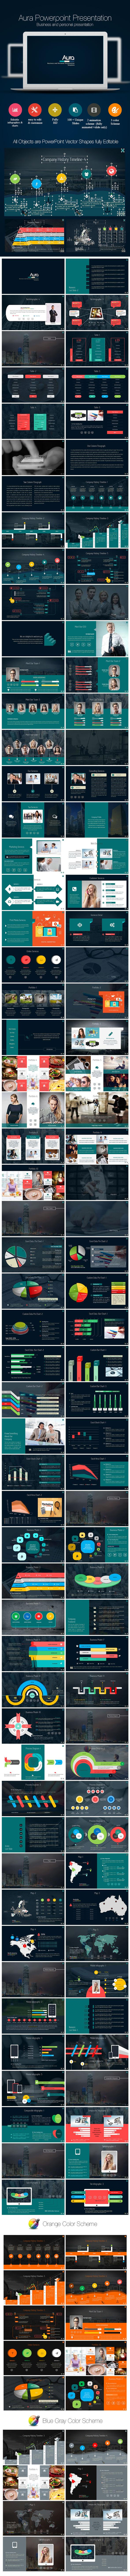 Aura Power Point Presentation - Business PowerPoint Templates